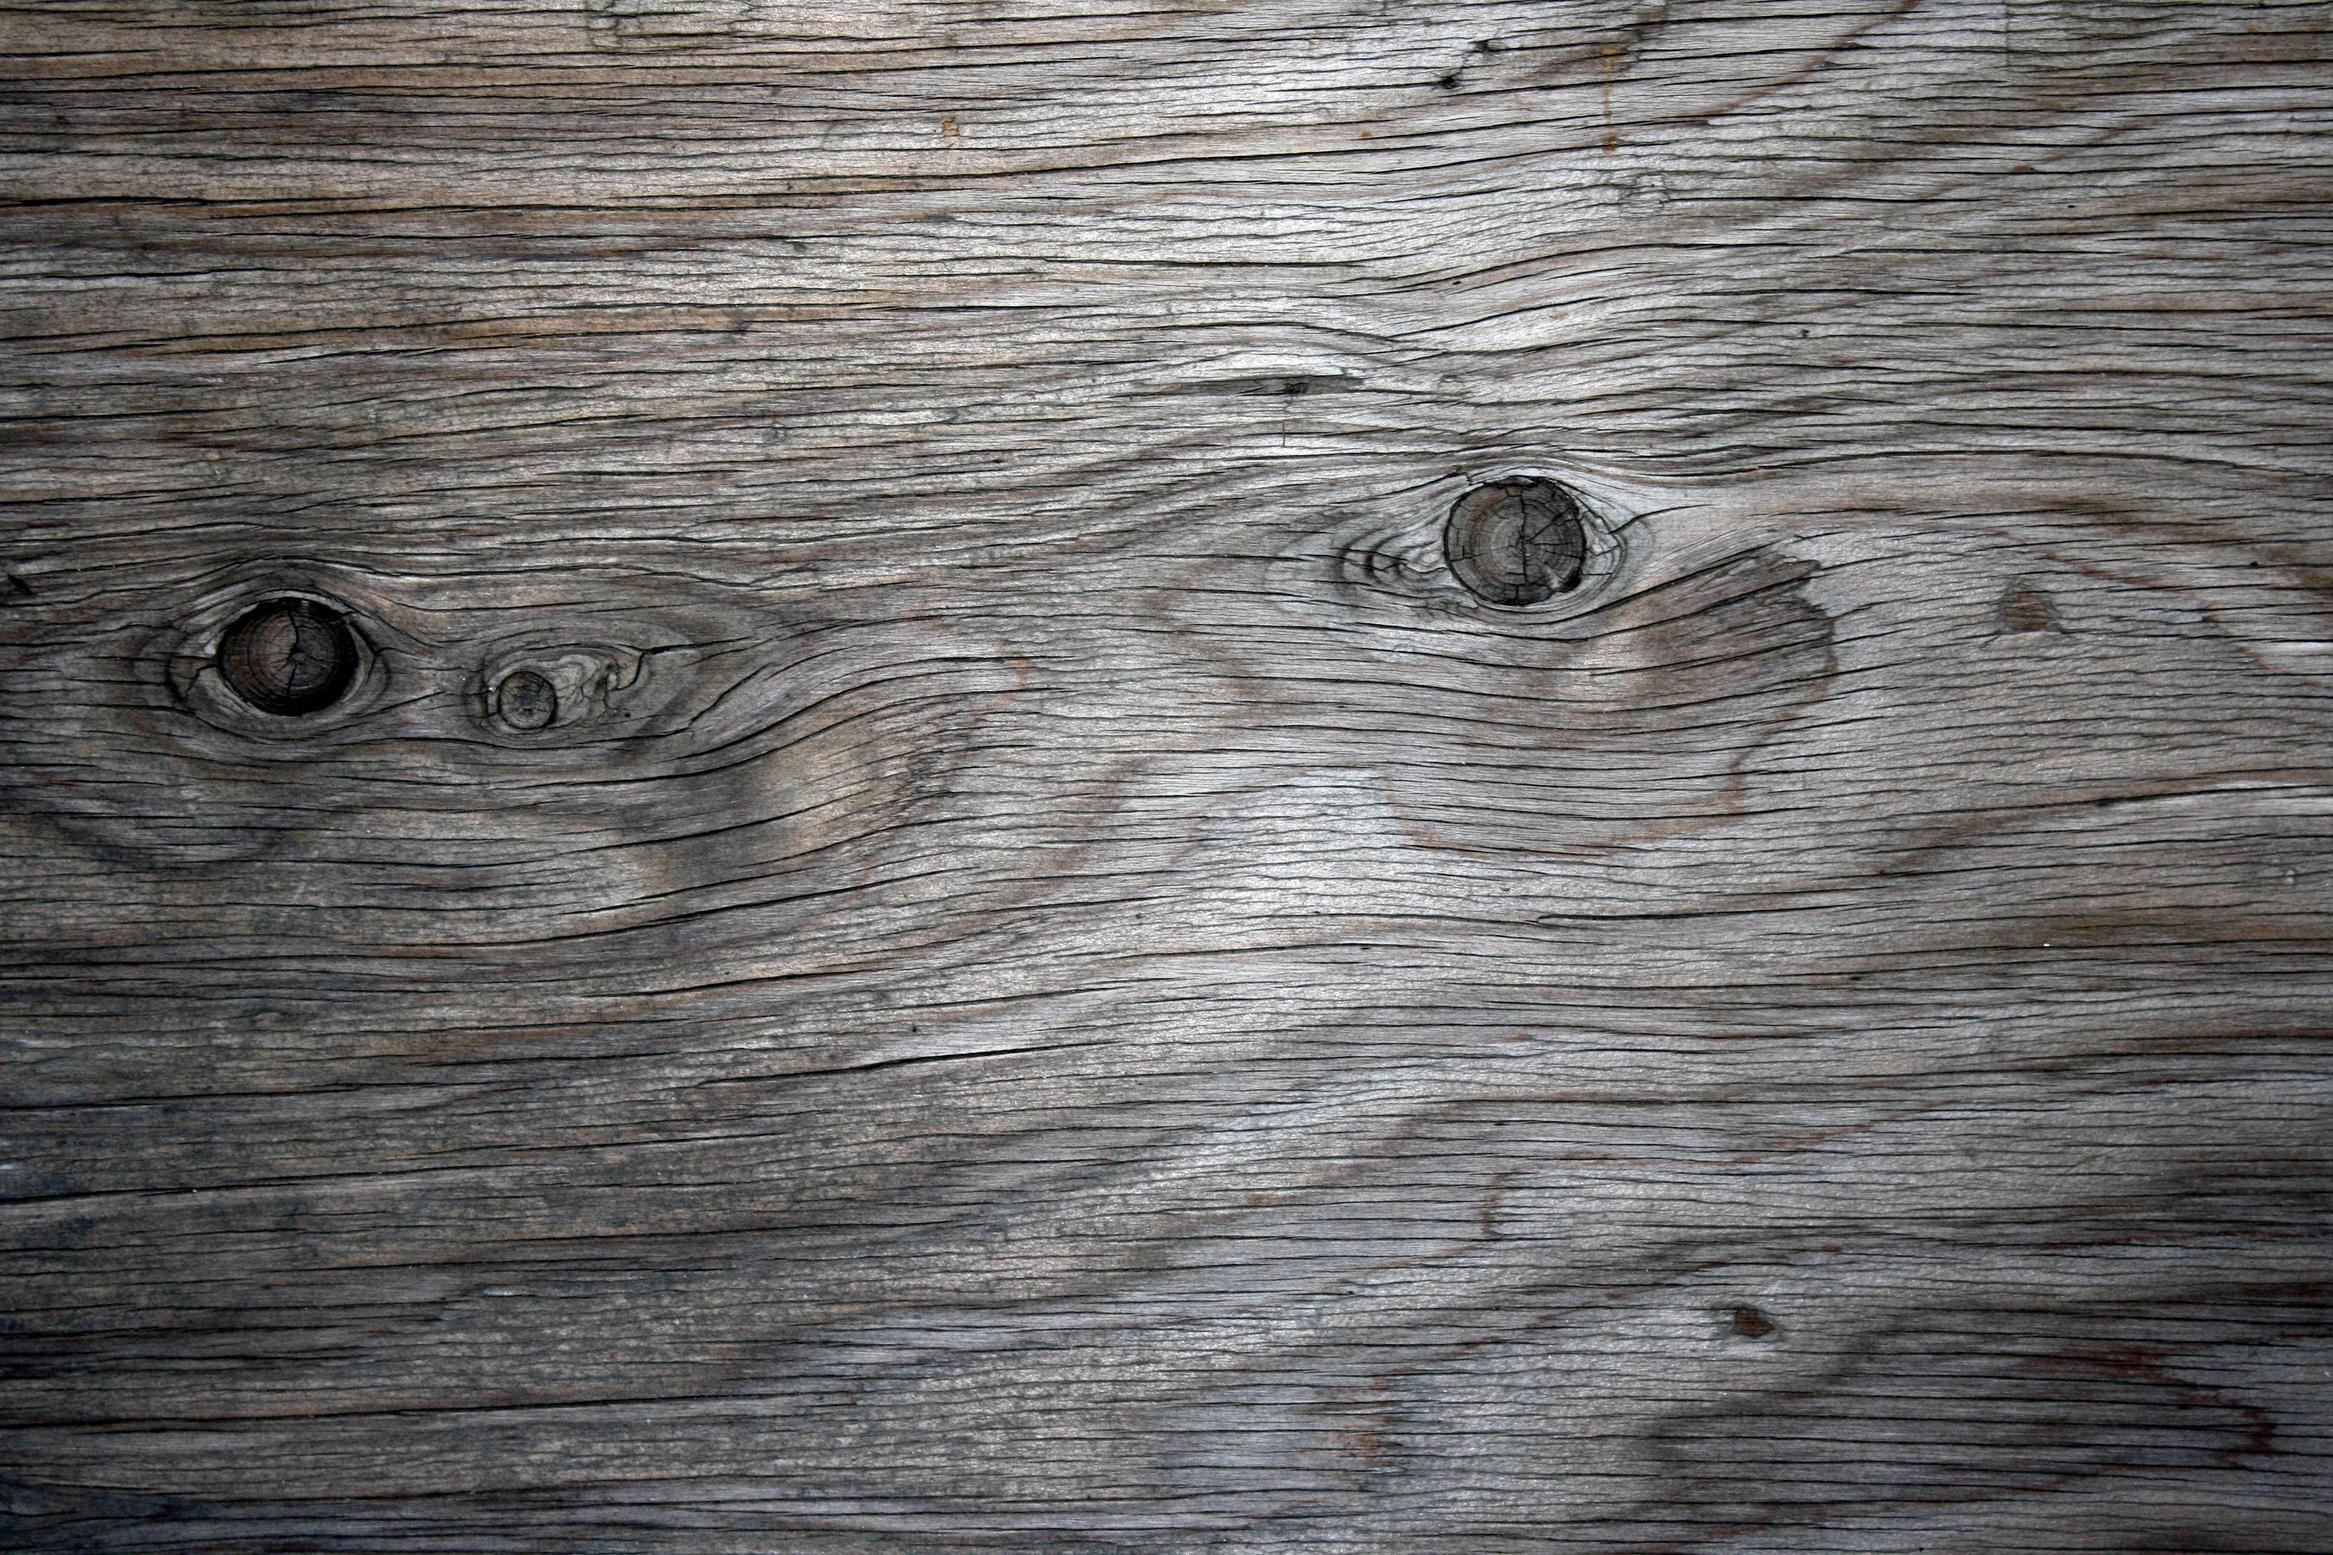 Wood Grain Wallpapers HD - Wallpaper - 792.9KB